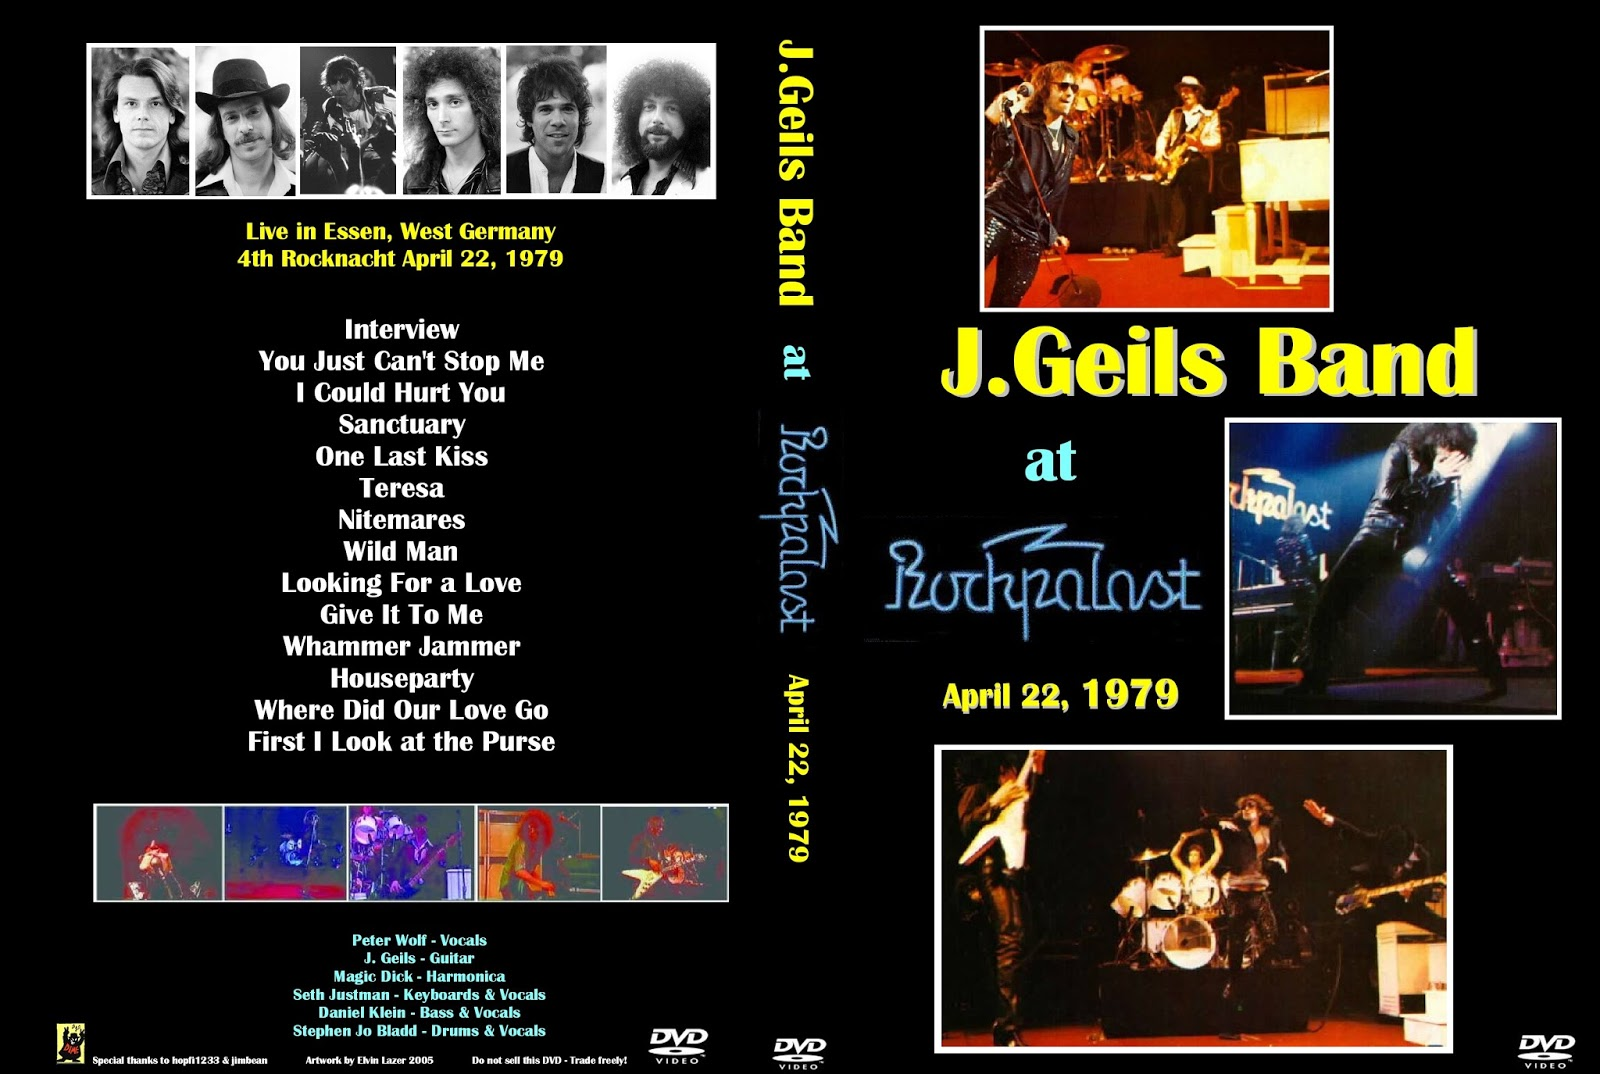 Geils band rockpalast 1979